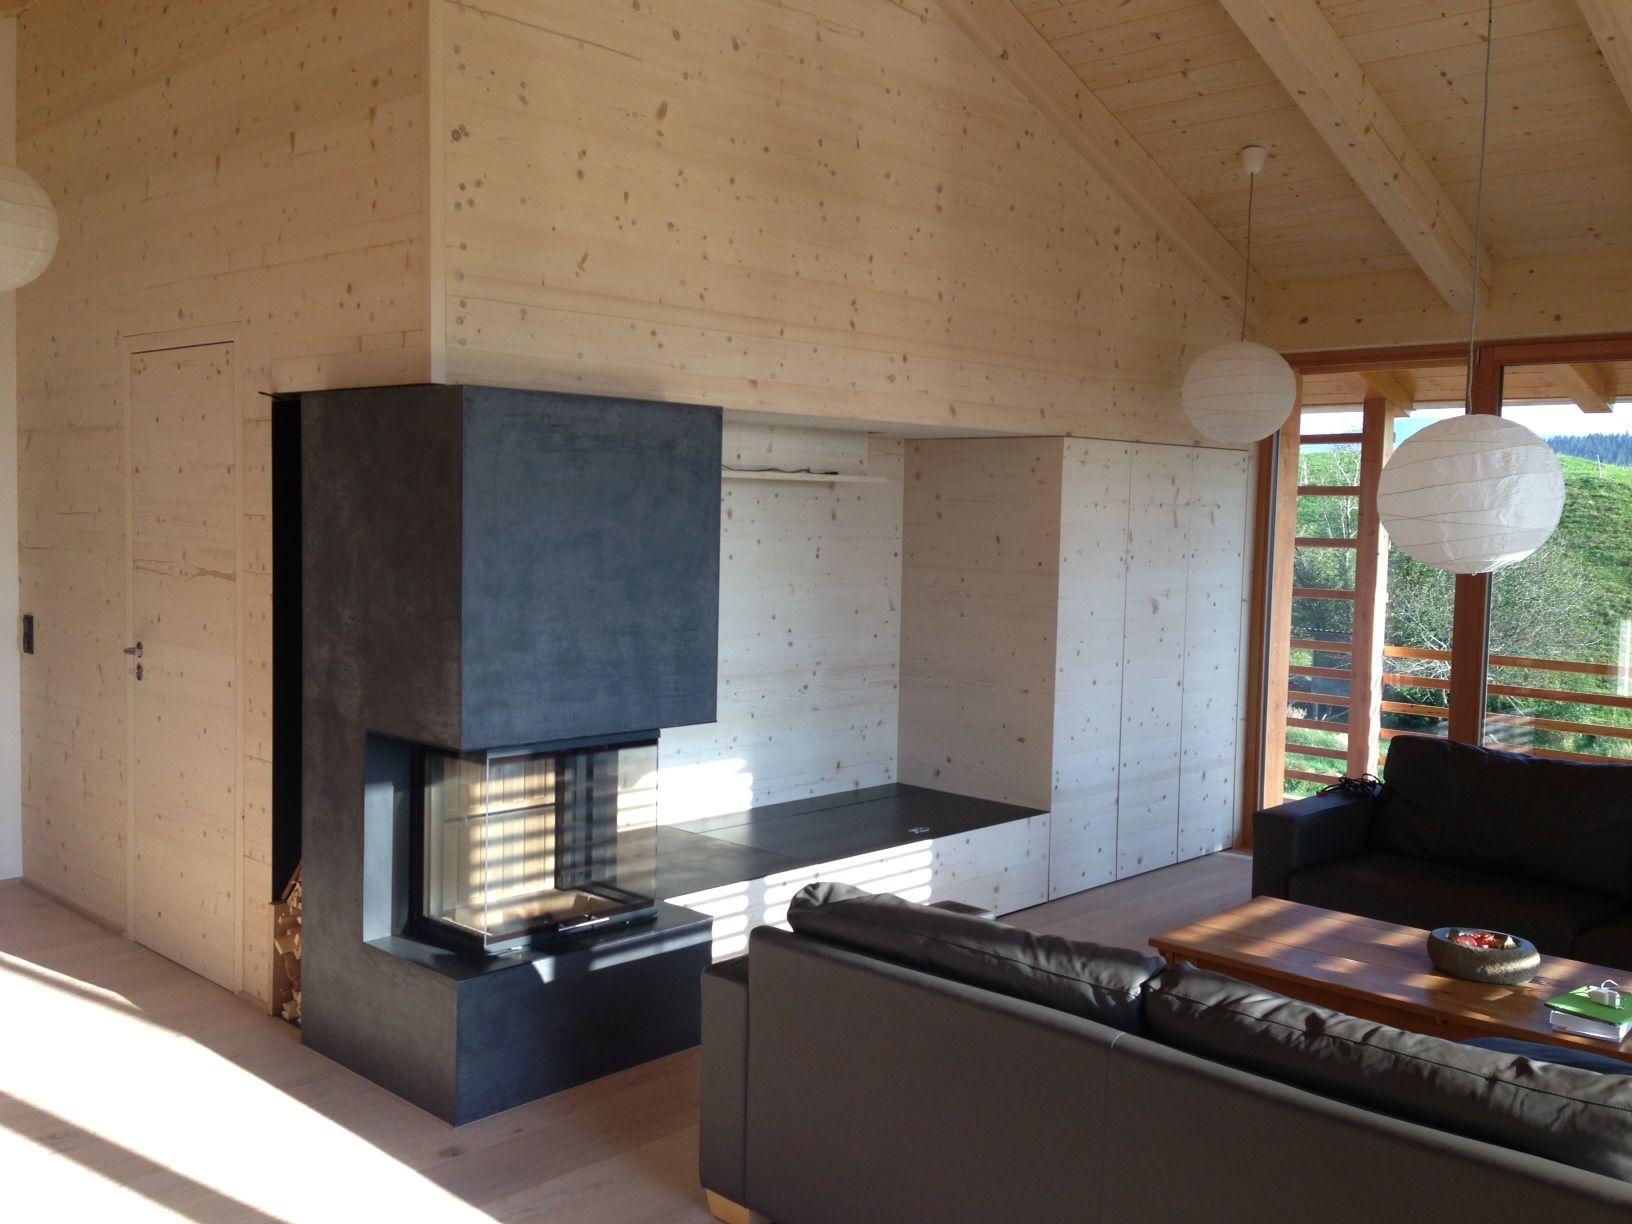 panoramakamin verputzt mit spachteltechnik #panoramakamin, Wohnzimmer dekoo